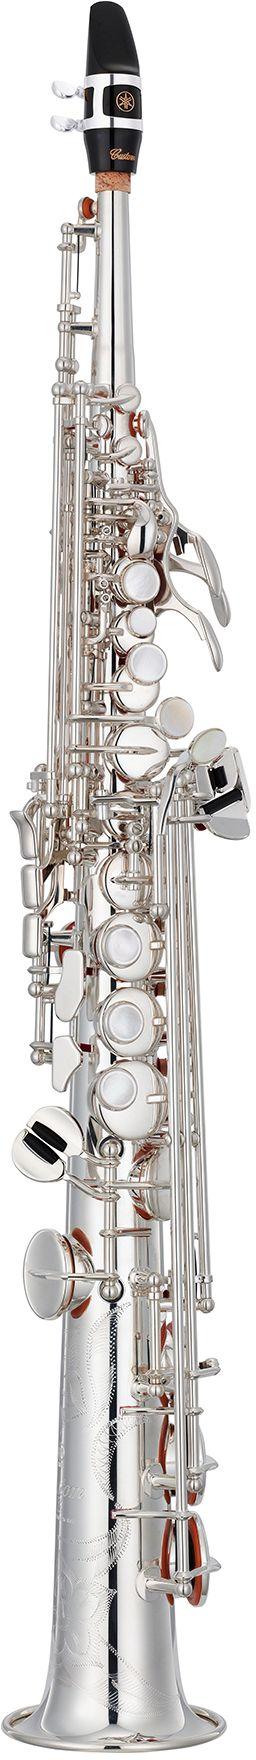 Yamaha Custom YSS-82ZS Soprano Saxophone